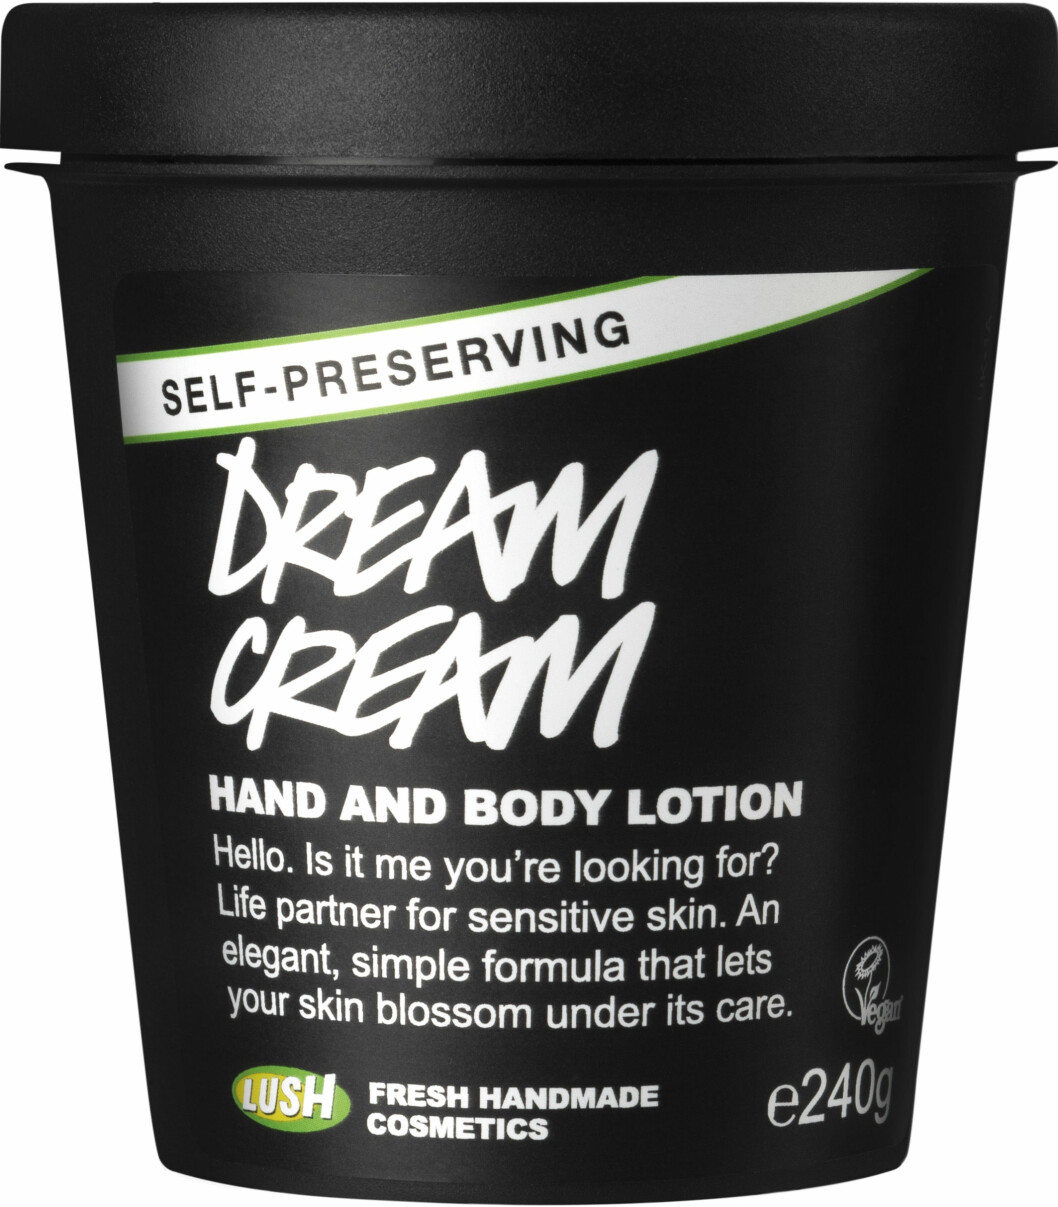 lusch dream cream